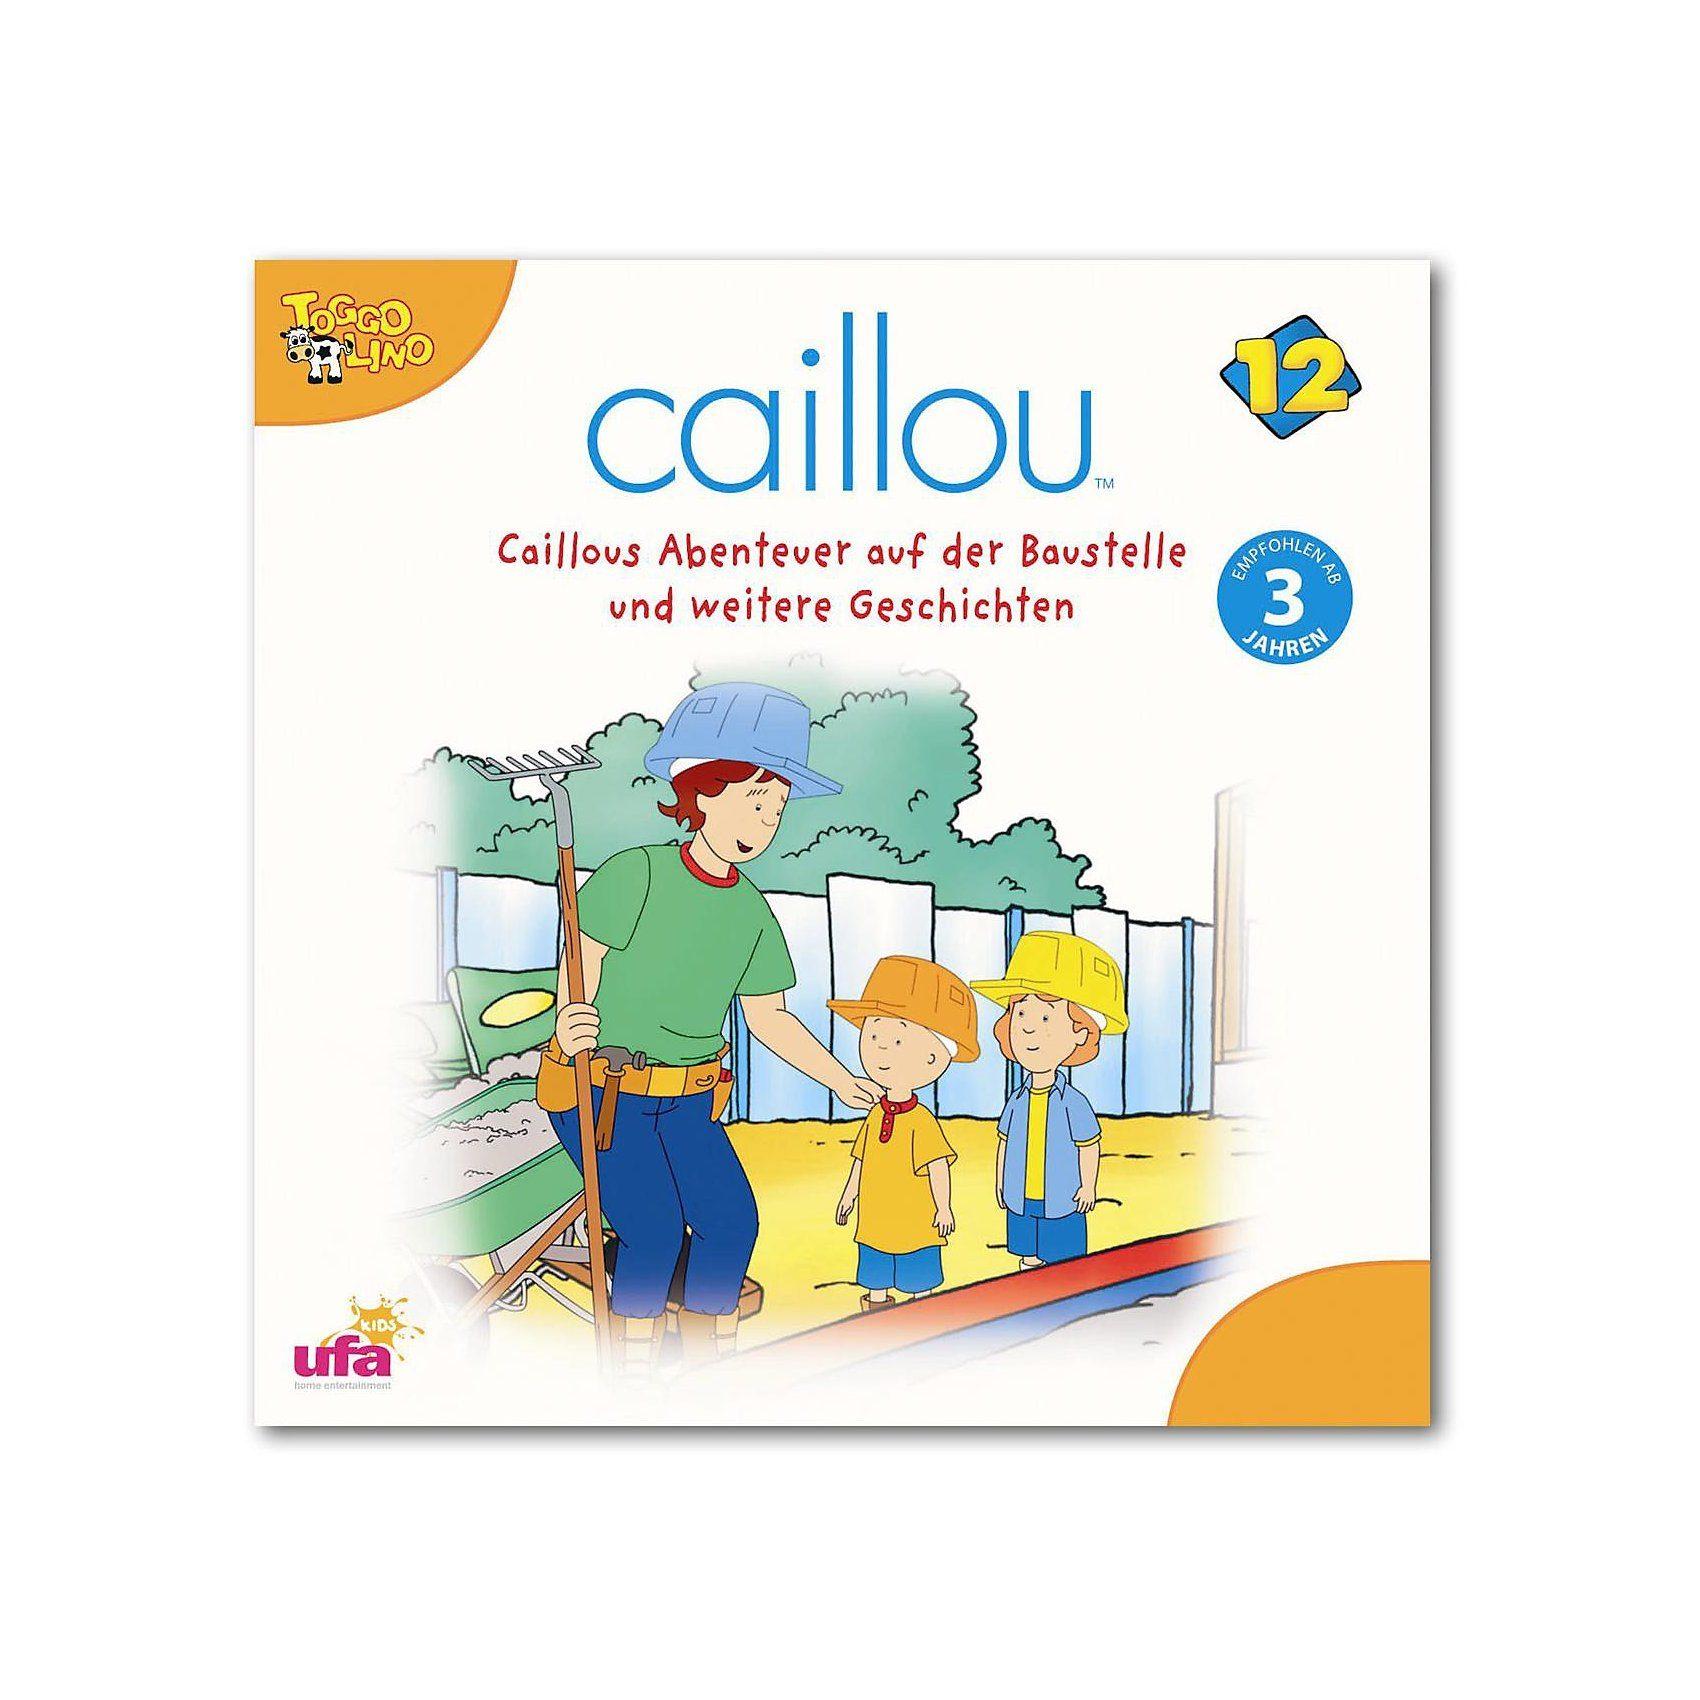 Sony CD Caillou 12 Abenteuer auf der Baustelle